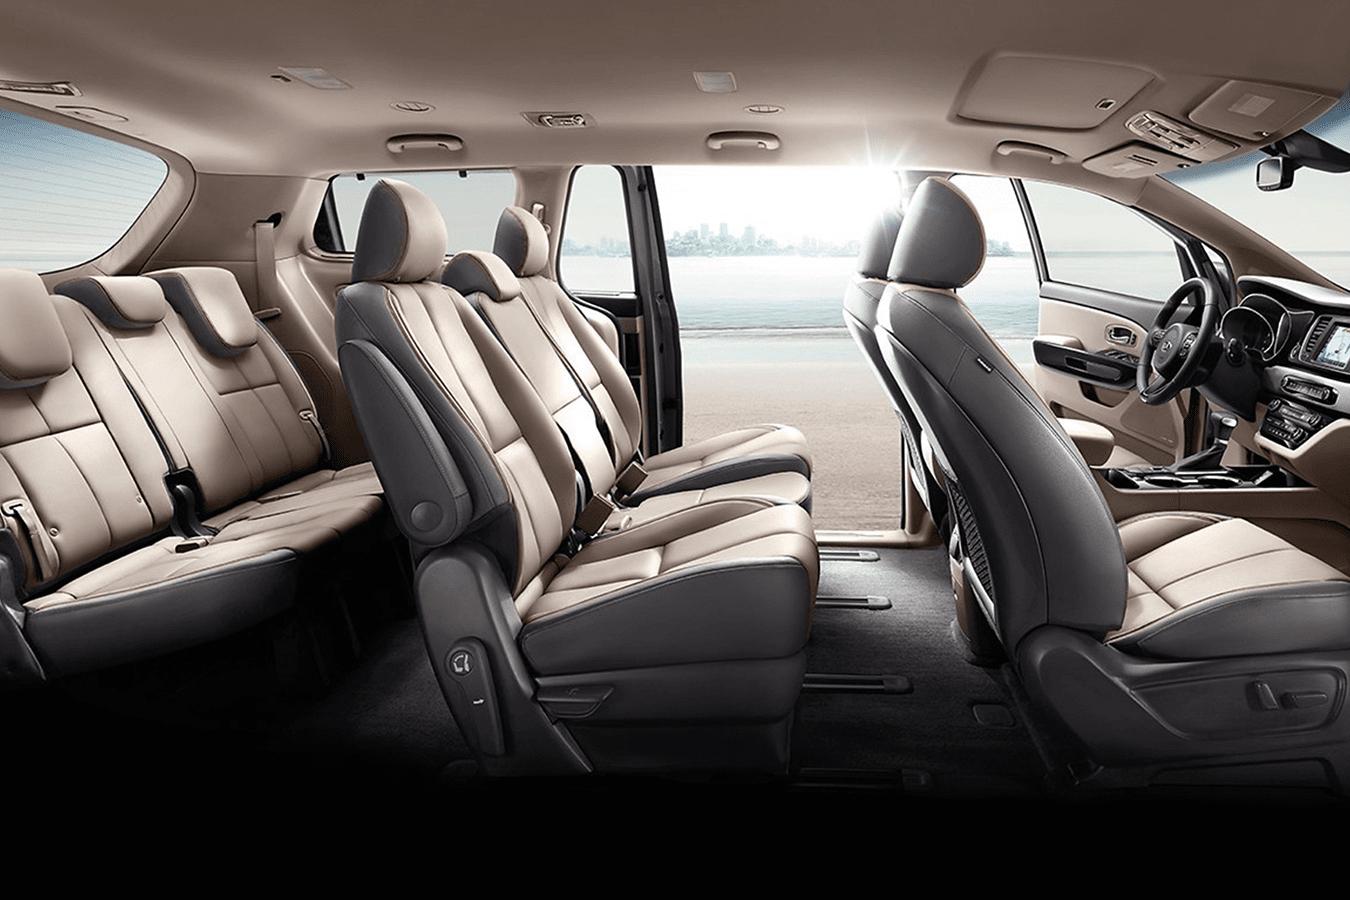 2020 Kia Sedona interior in leather and passenger volume